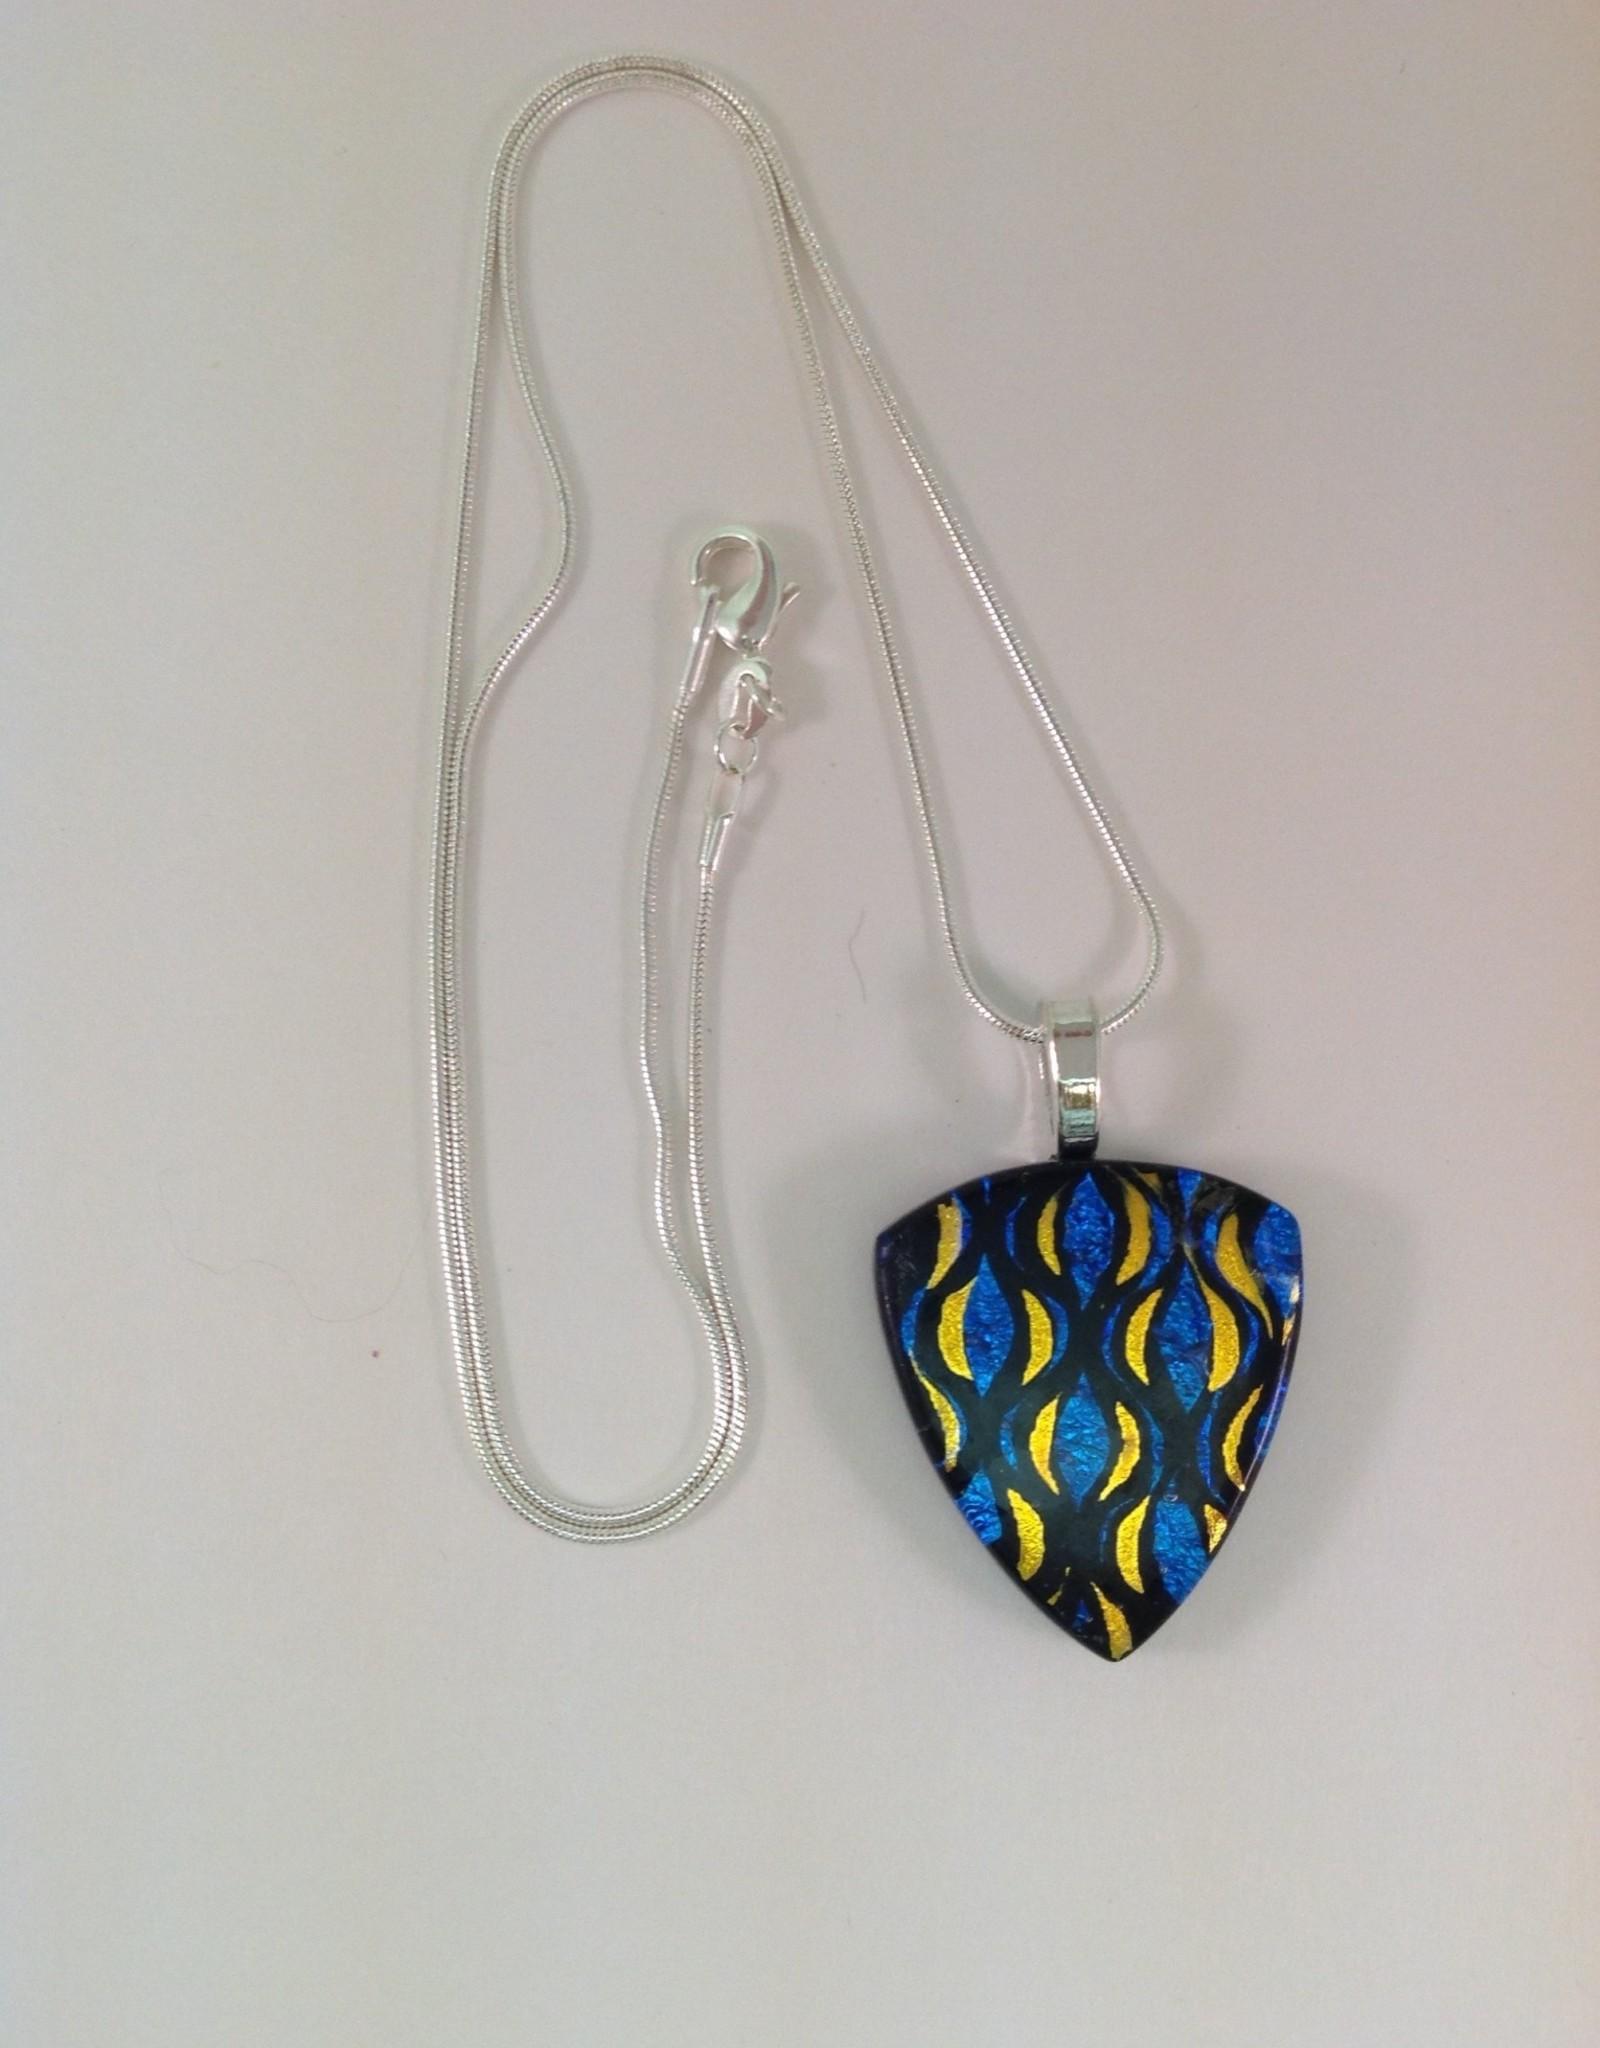 Ann Mackiernan Fused Glass Pendant Medium - M47